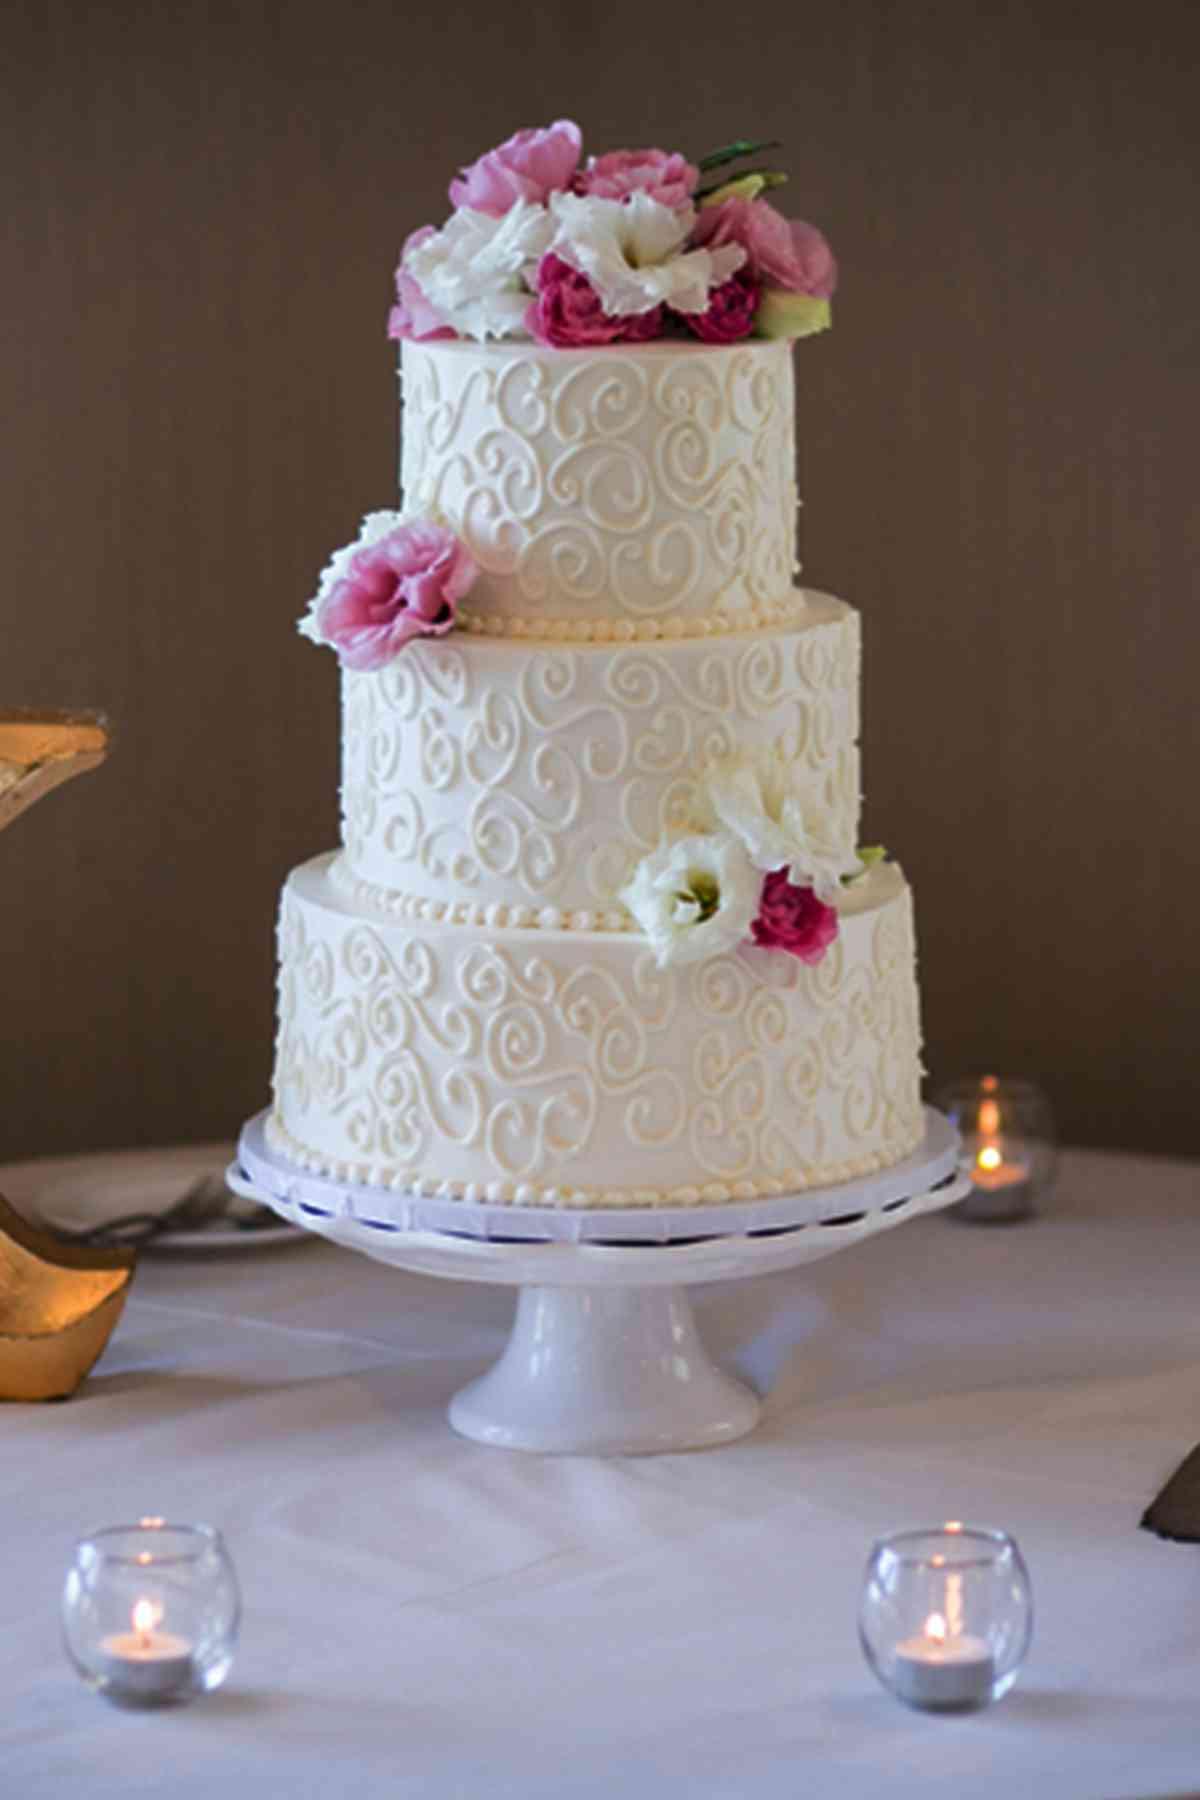 Wedding Cakes Simple  Simple three layered white wedding cake with swirls